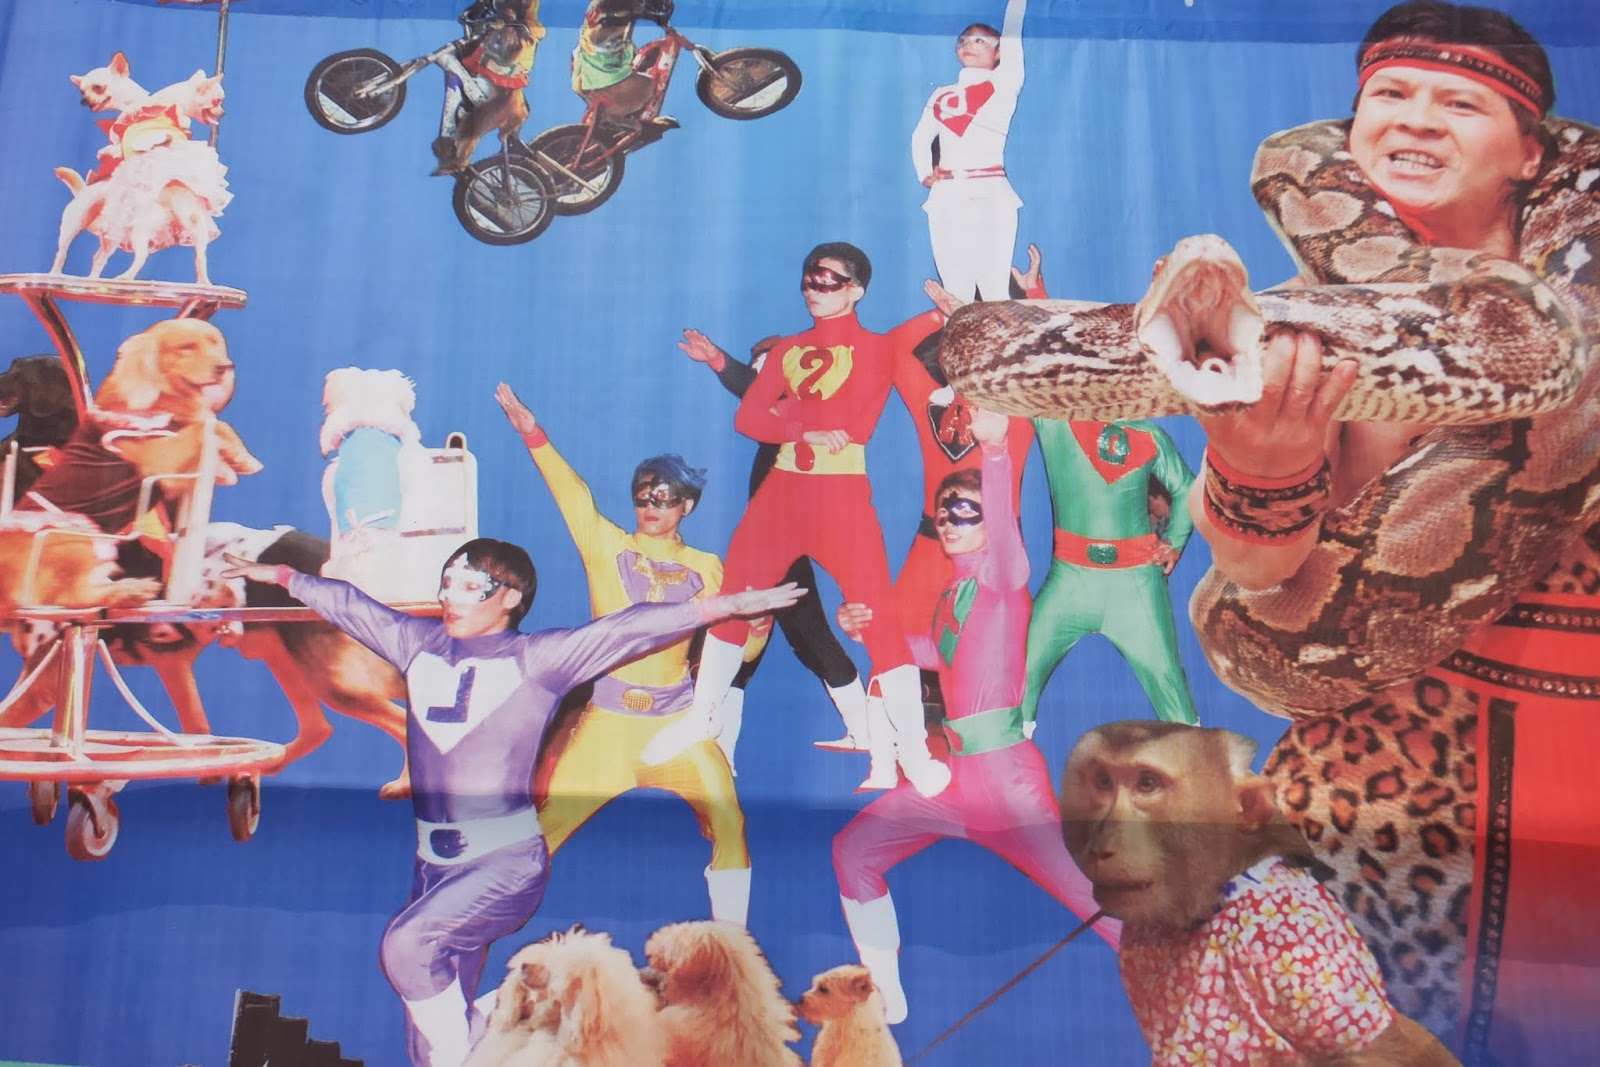 hanoi-circus-ad ハノイサーカス広告:戦隊